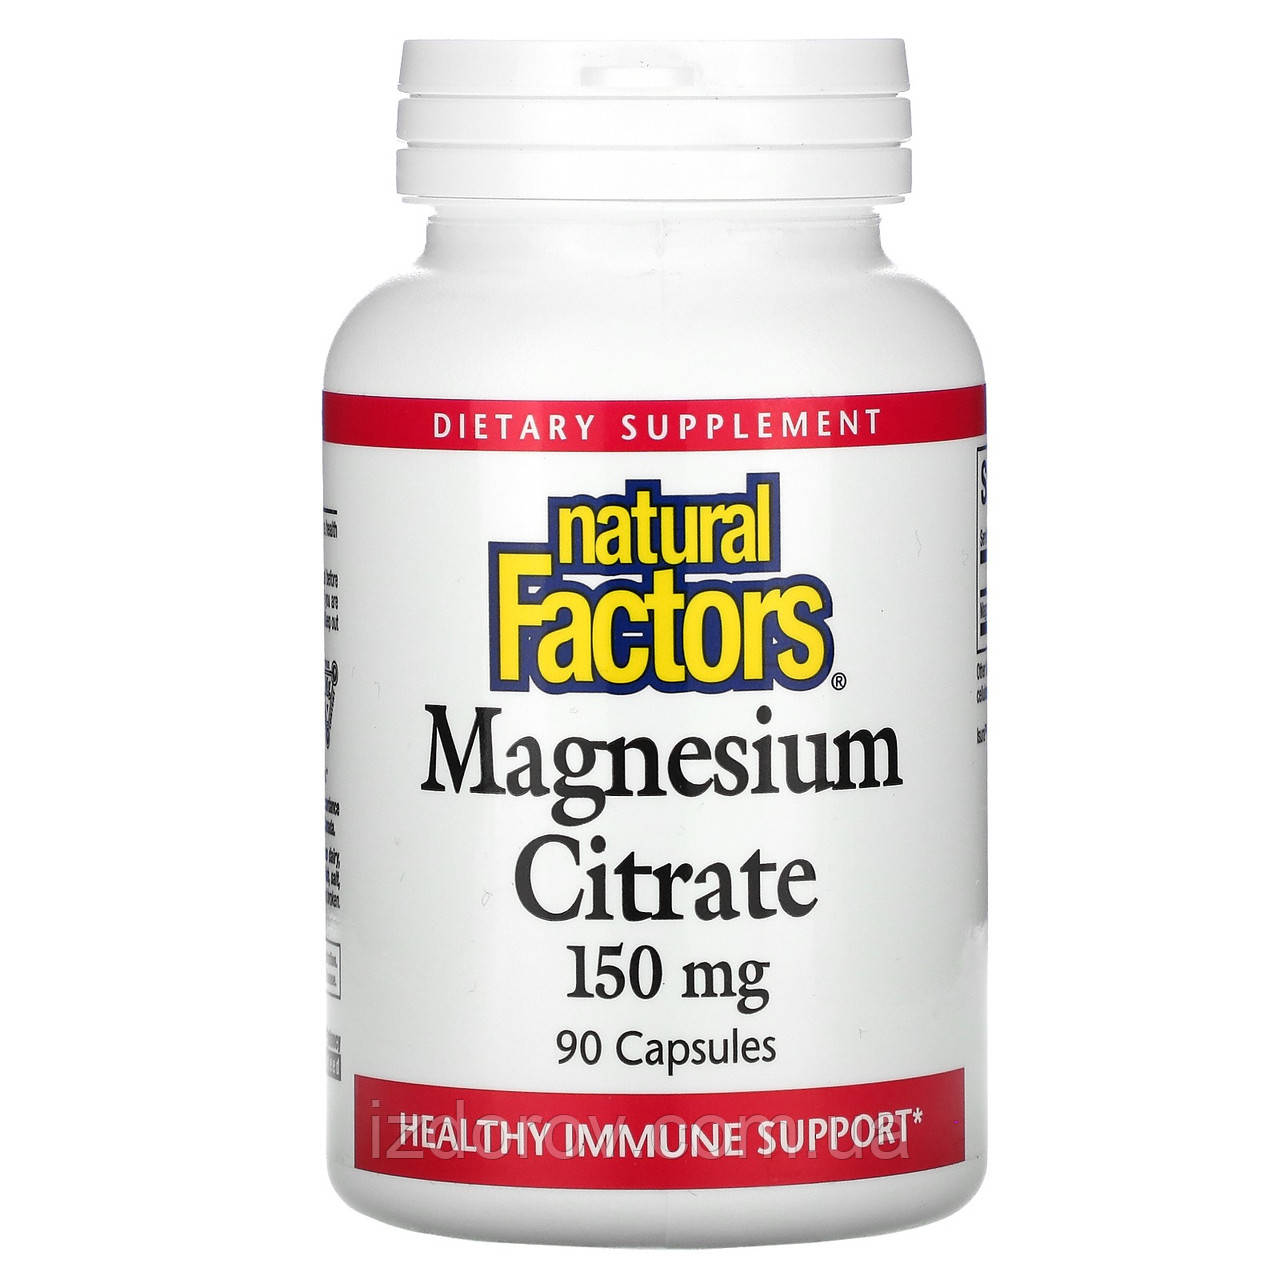 Natural Factors, Цитрат магнію, 150 мг, Magnesium Citrate, 90 капсул